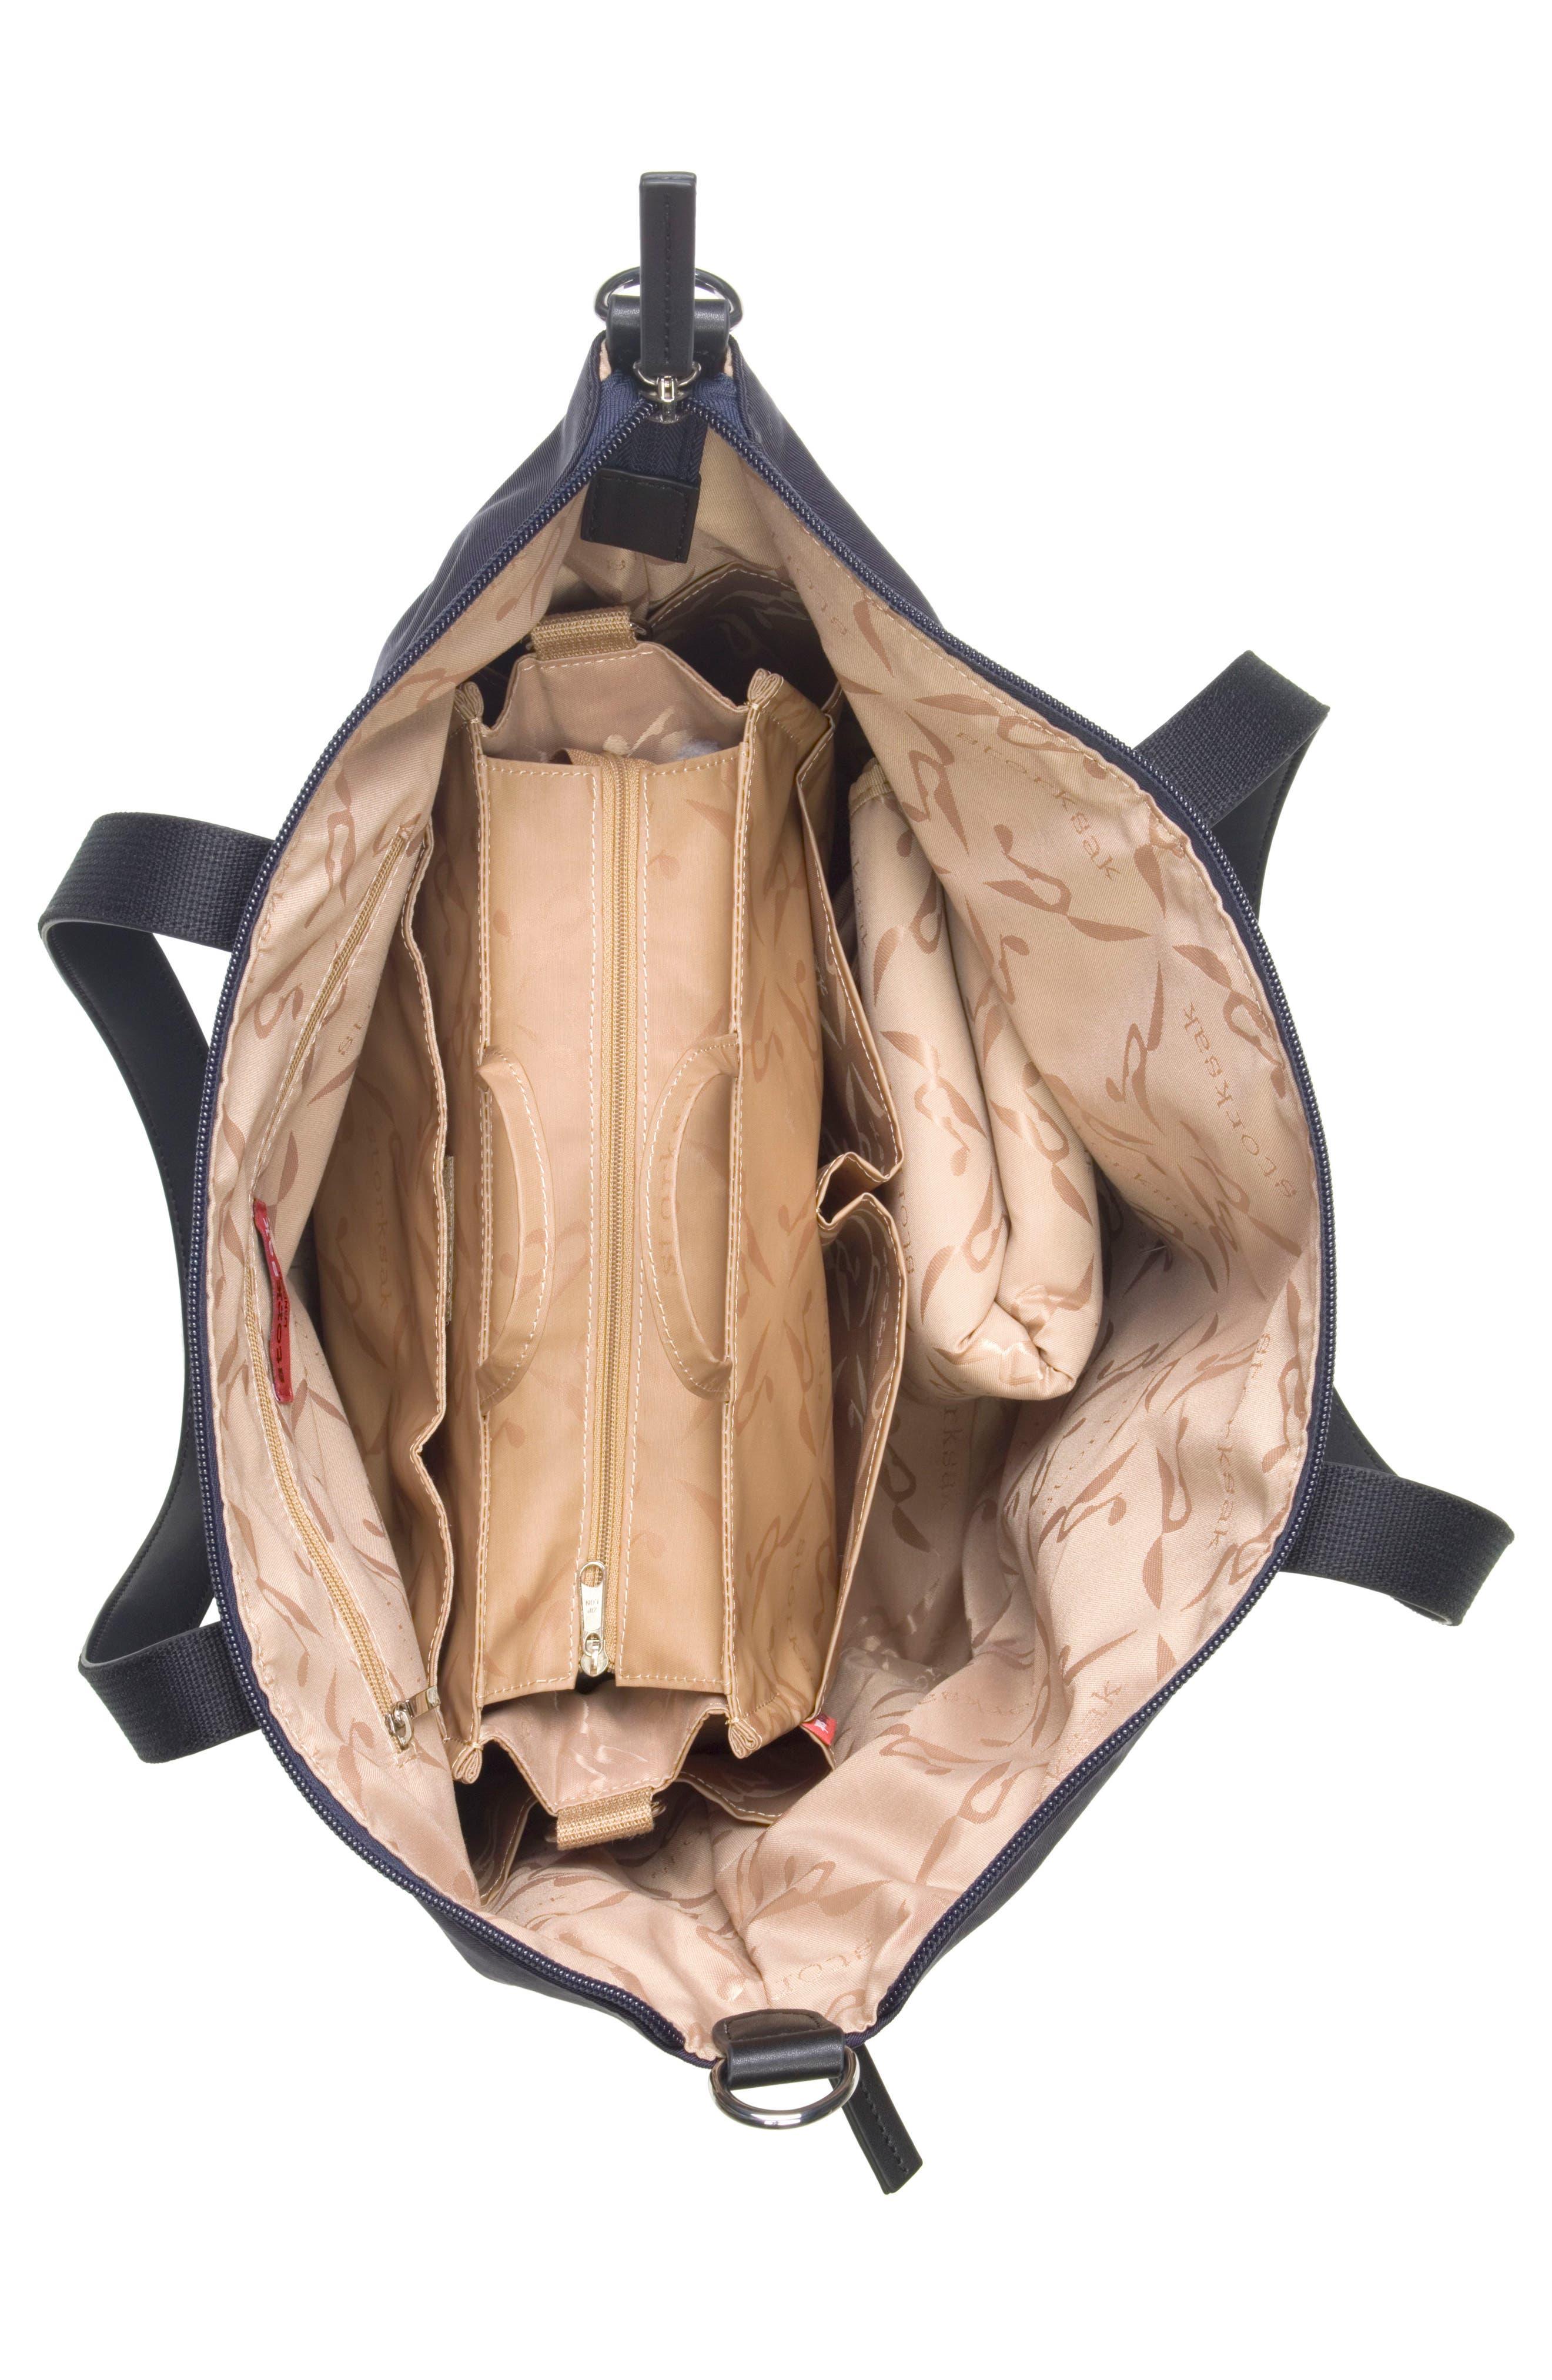 Noa Luxe Diaper Bag,                             Alternate thumbnail 5, color,                             Midnight Blue